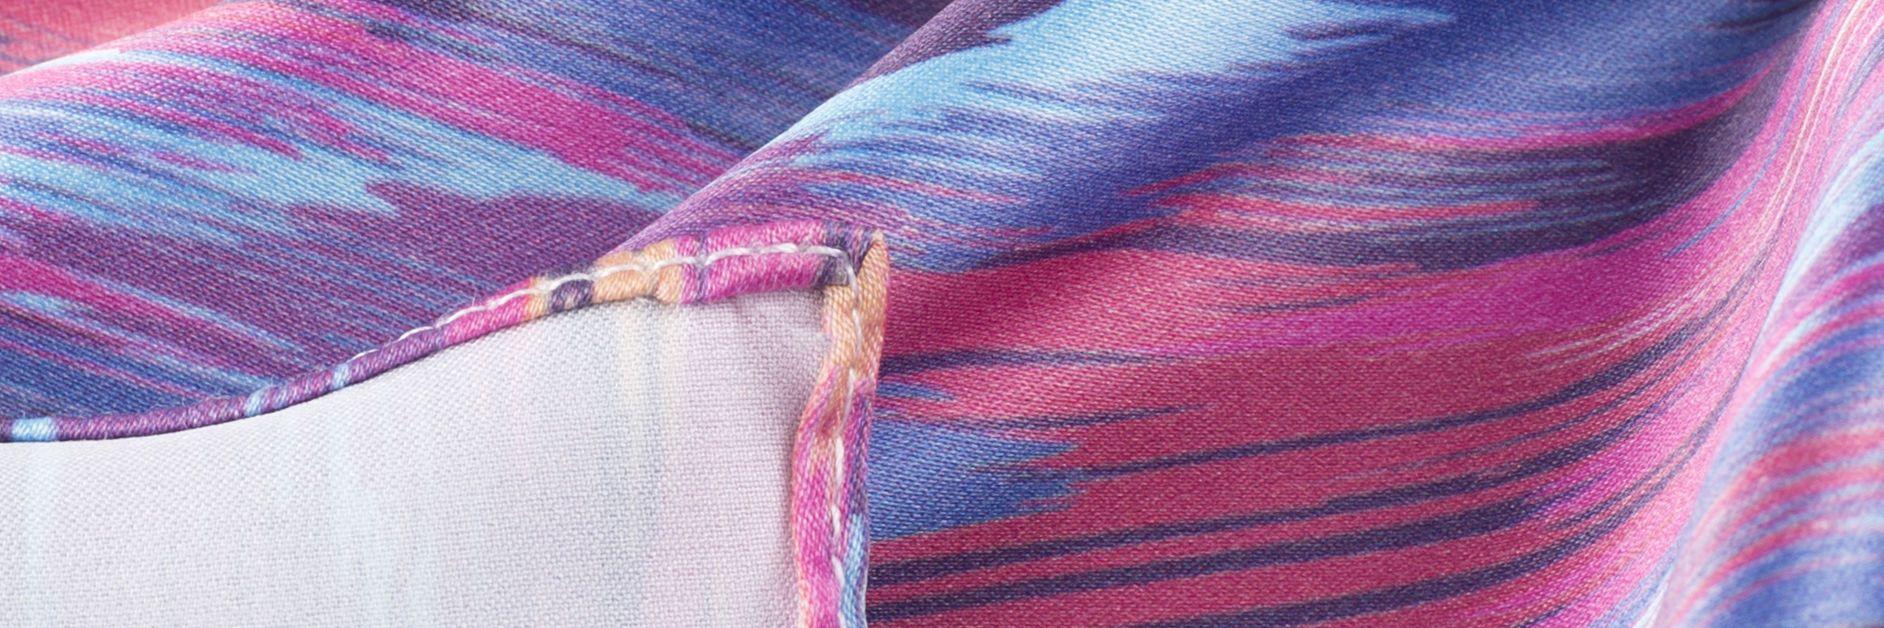 silk sensation for hijabs